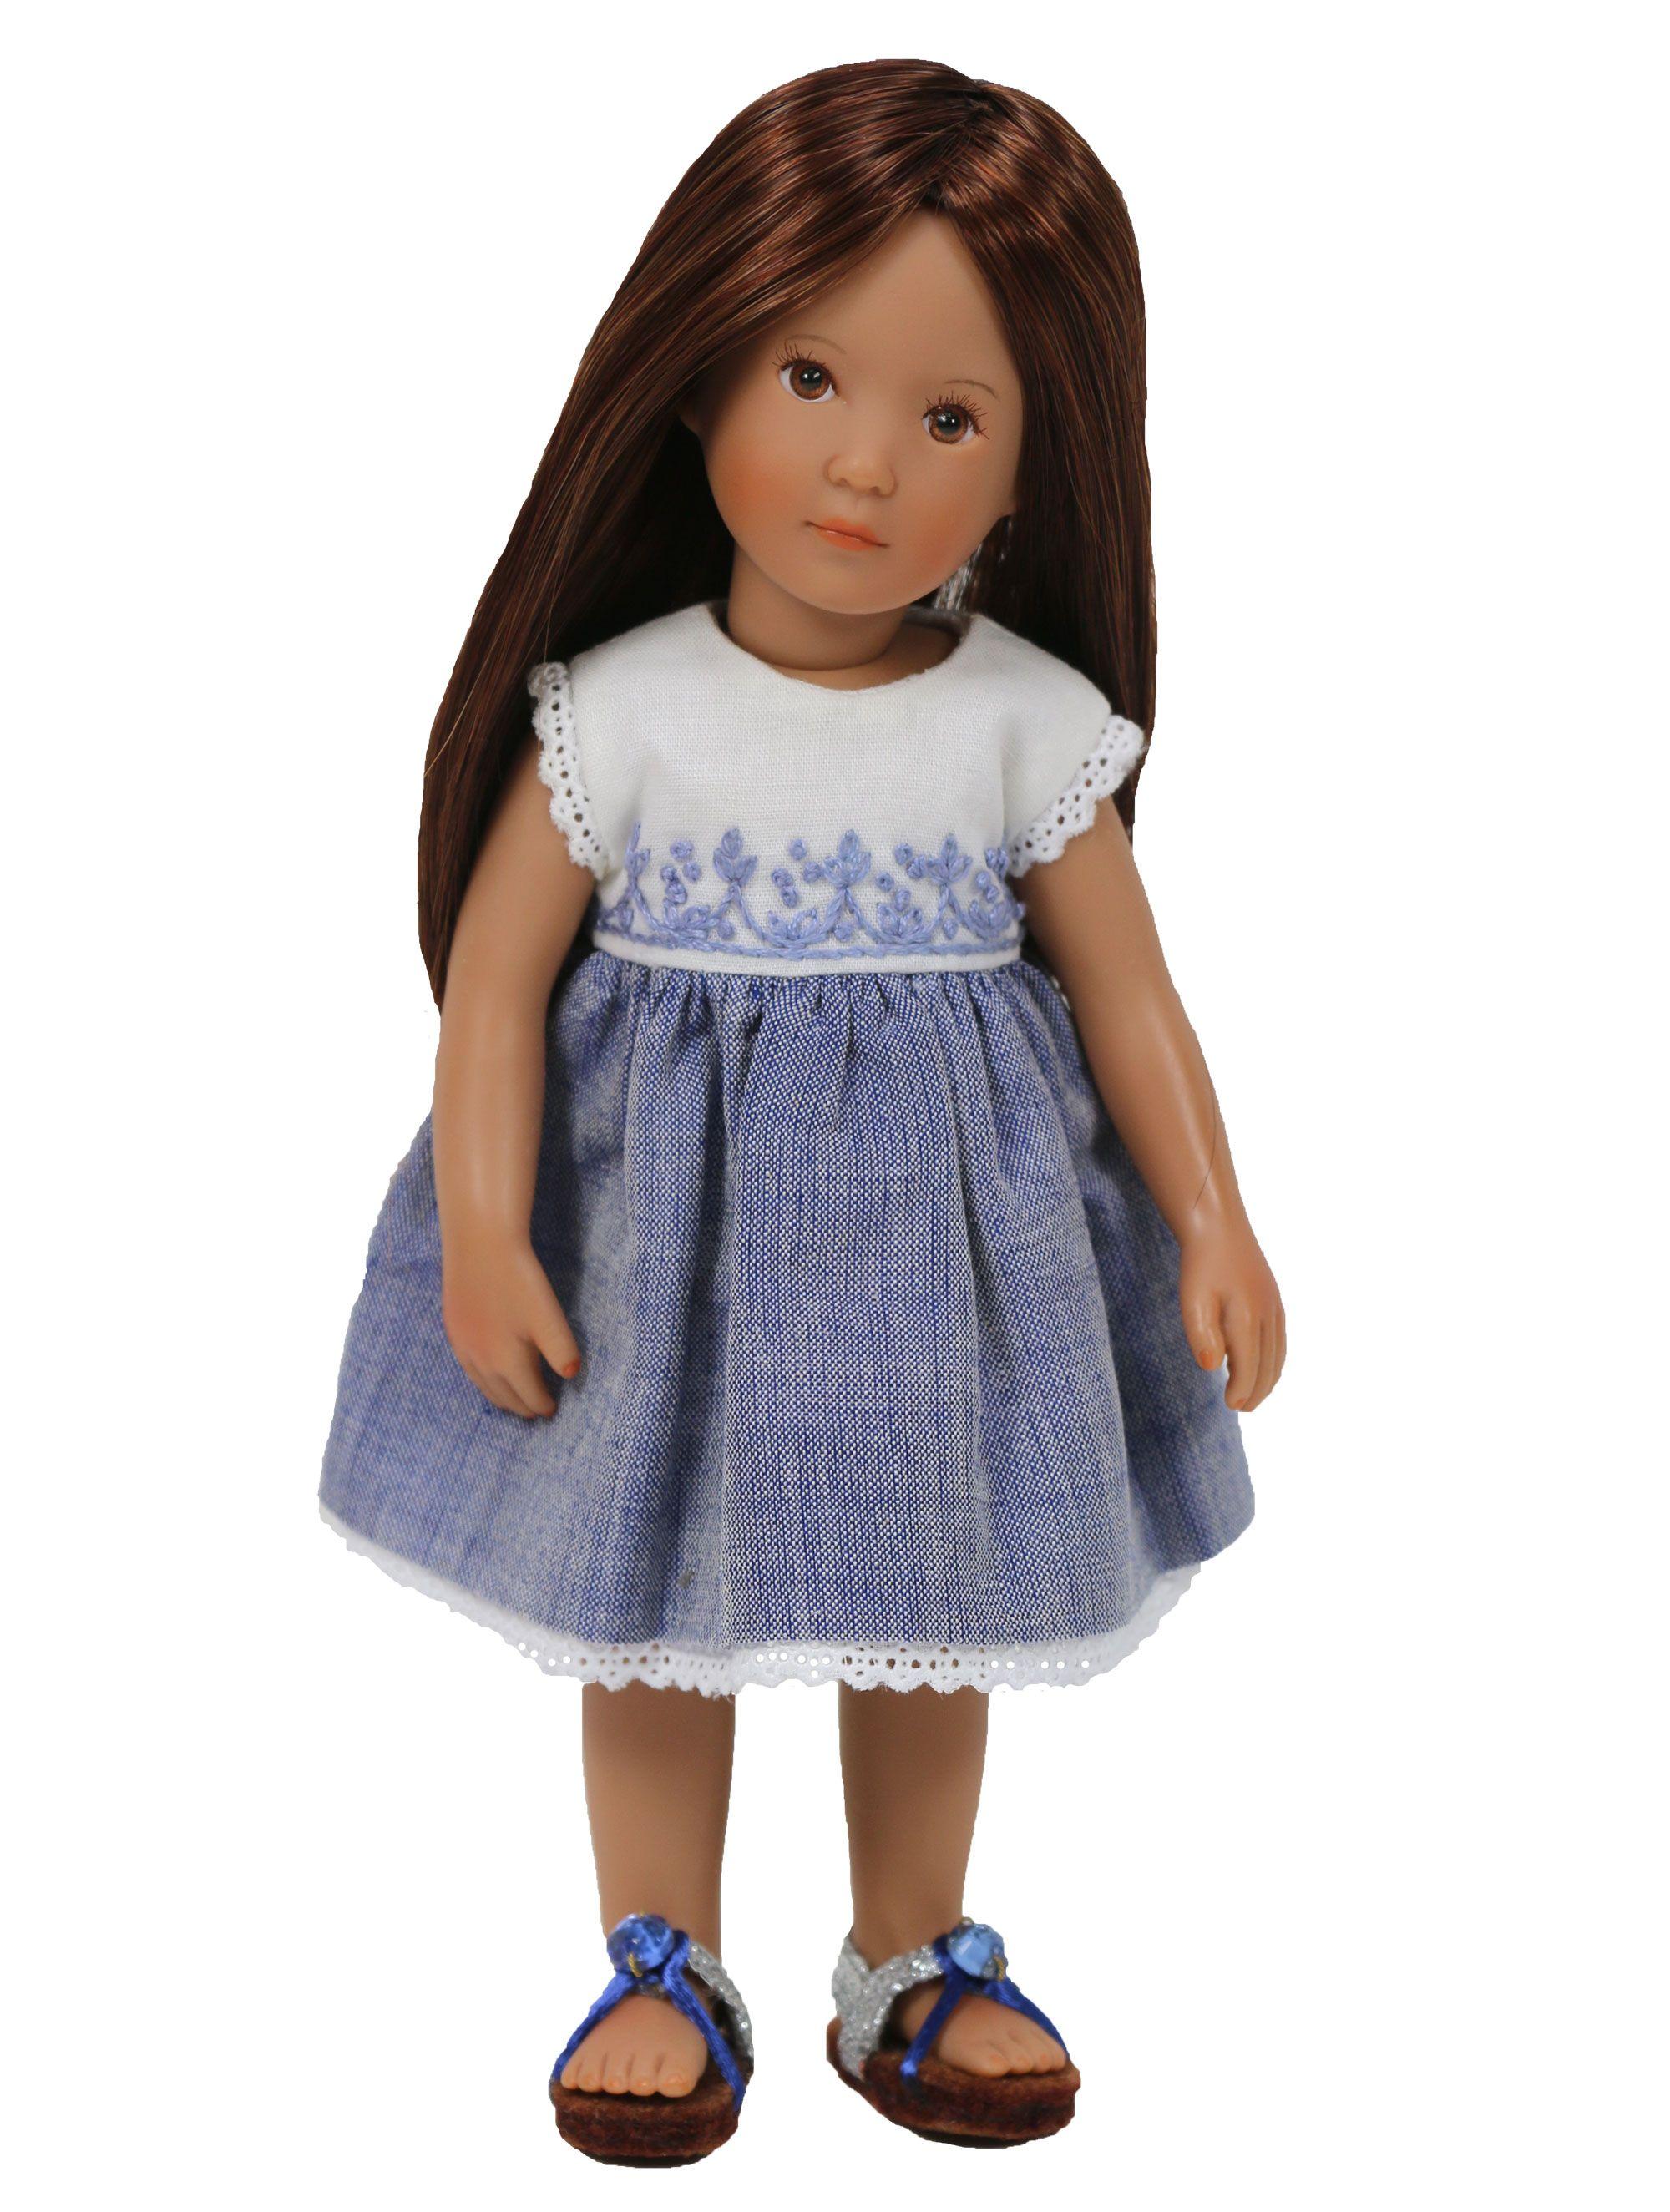 "Embroidered Bodice Blue Chambray Boneka Mini Dress 18-21cm/7-8"" by Boneka for Fun In Faith mini doll Hannah sculpted by Sonja Hartmann - at www.mydollbestfriend.co.uk"